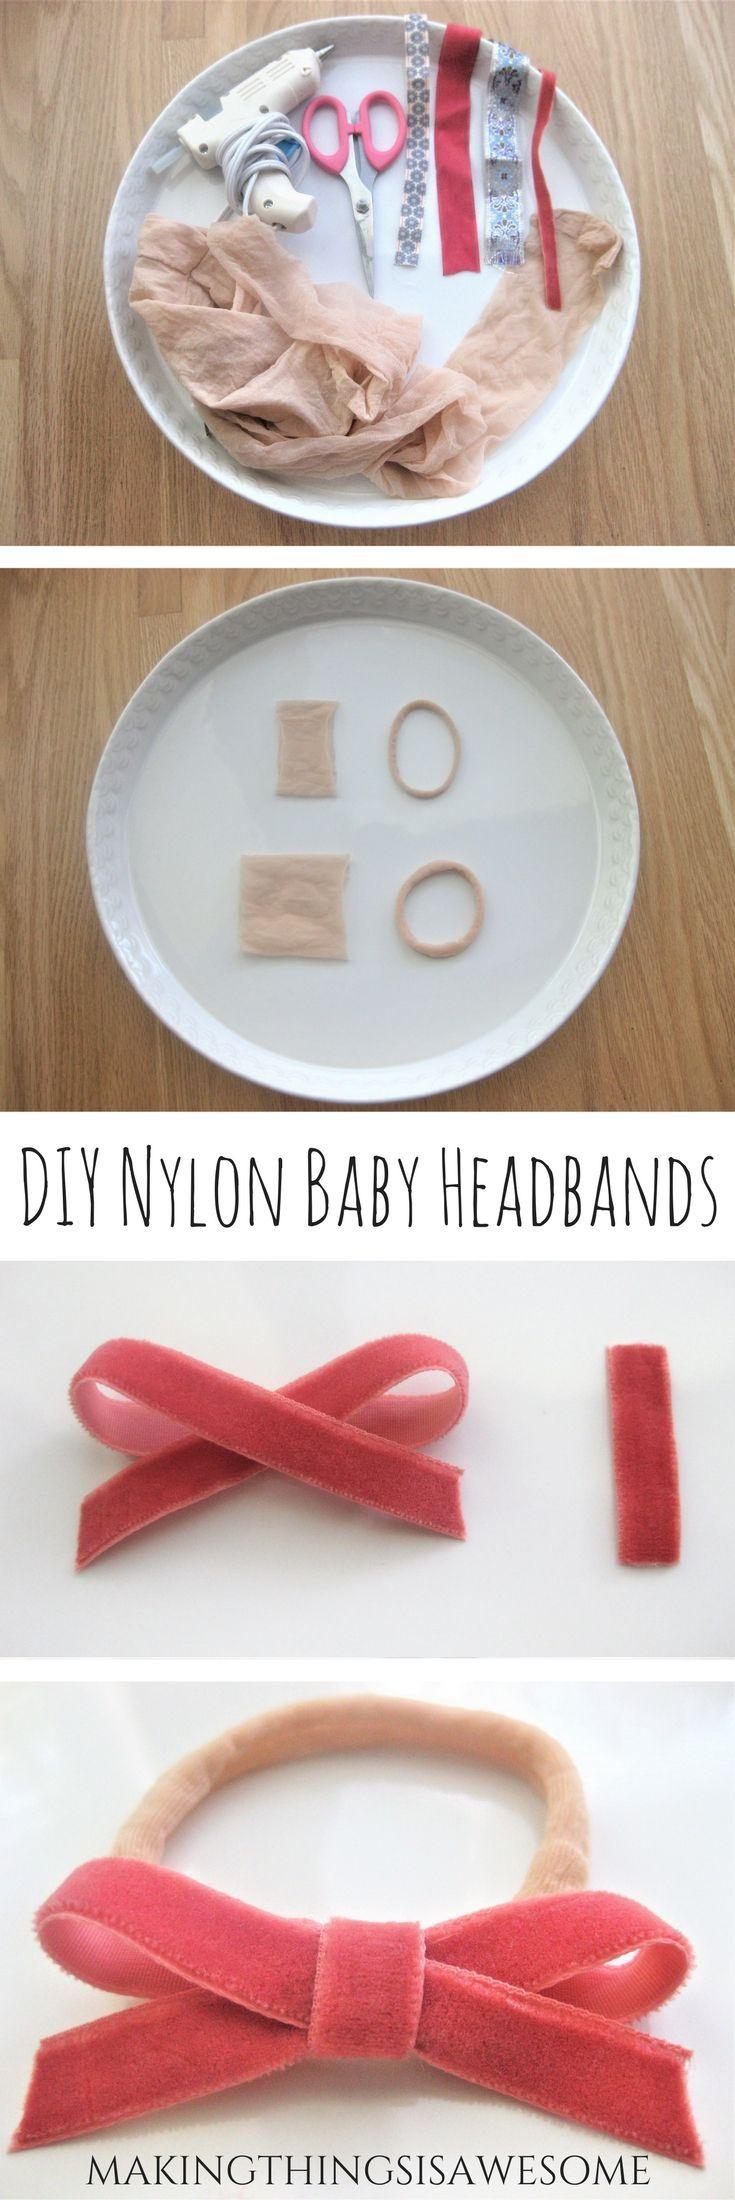 DIY Baby Nylon Headband with a Super Cute Bow! - Tutorial #diybabyheadbands